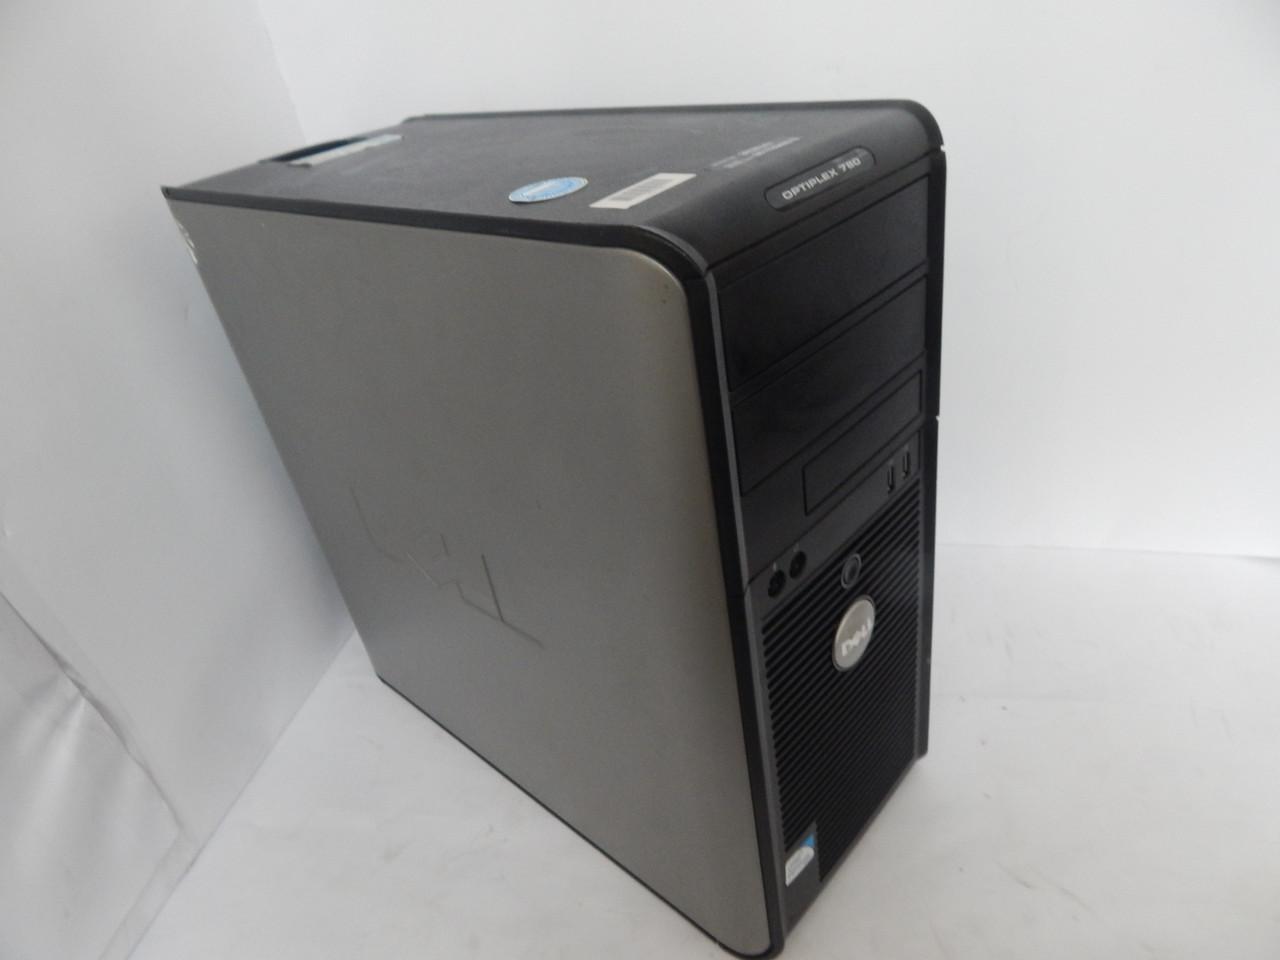 Системный блок Dell 780 E5300 RAM 4ГБ ддр3 hdd 160 radeon hd3450  Компьютер